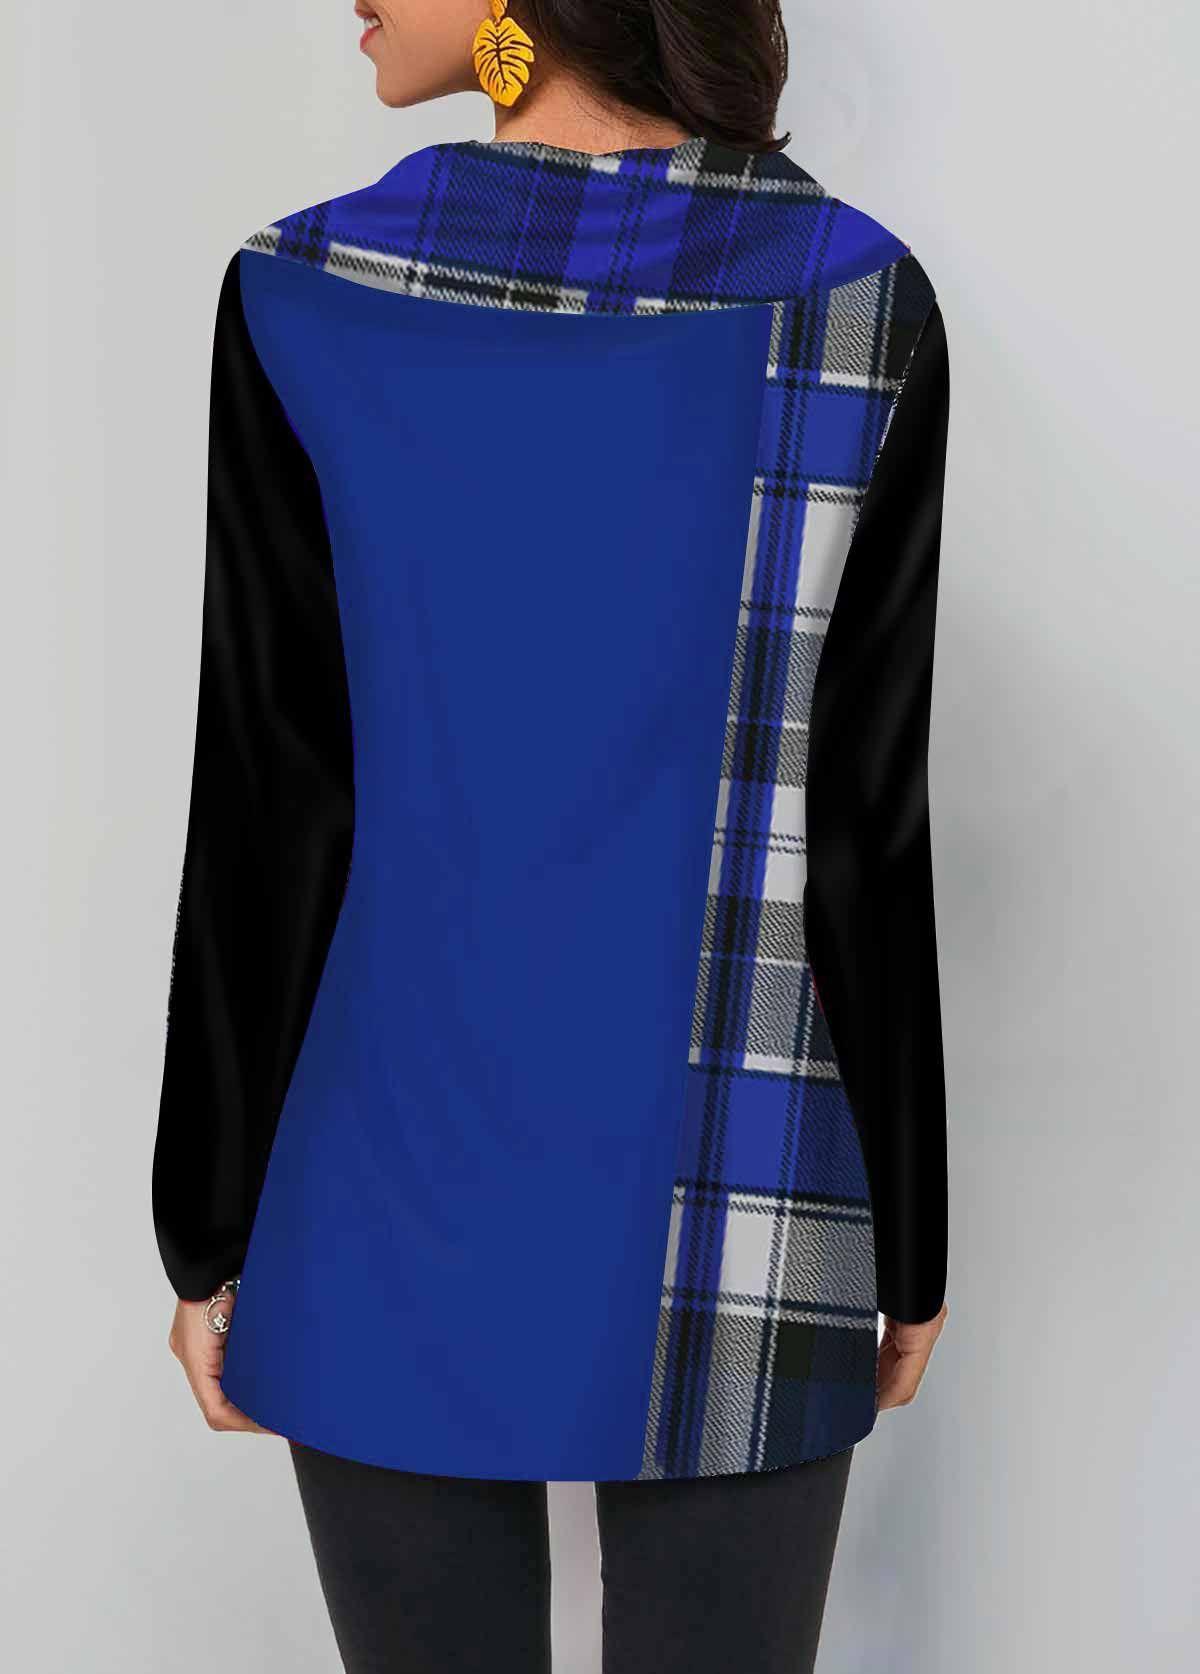 Long Sleeve Plaid Print Button Detail T Shirt Linkshe Com Usd 22 70 Affiliate Print Button Plaid In 2020 Trendy Tops For Women Long Sleeve Plaid Trendy Tops